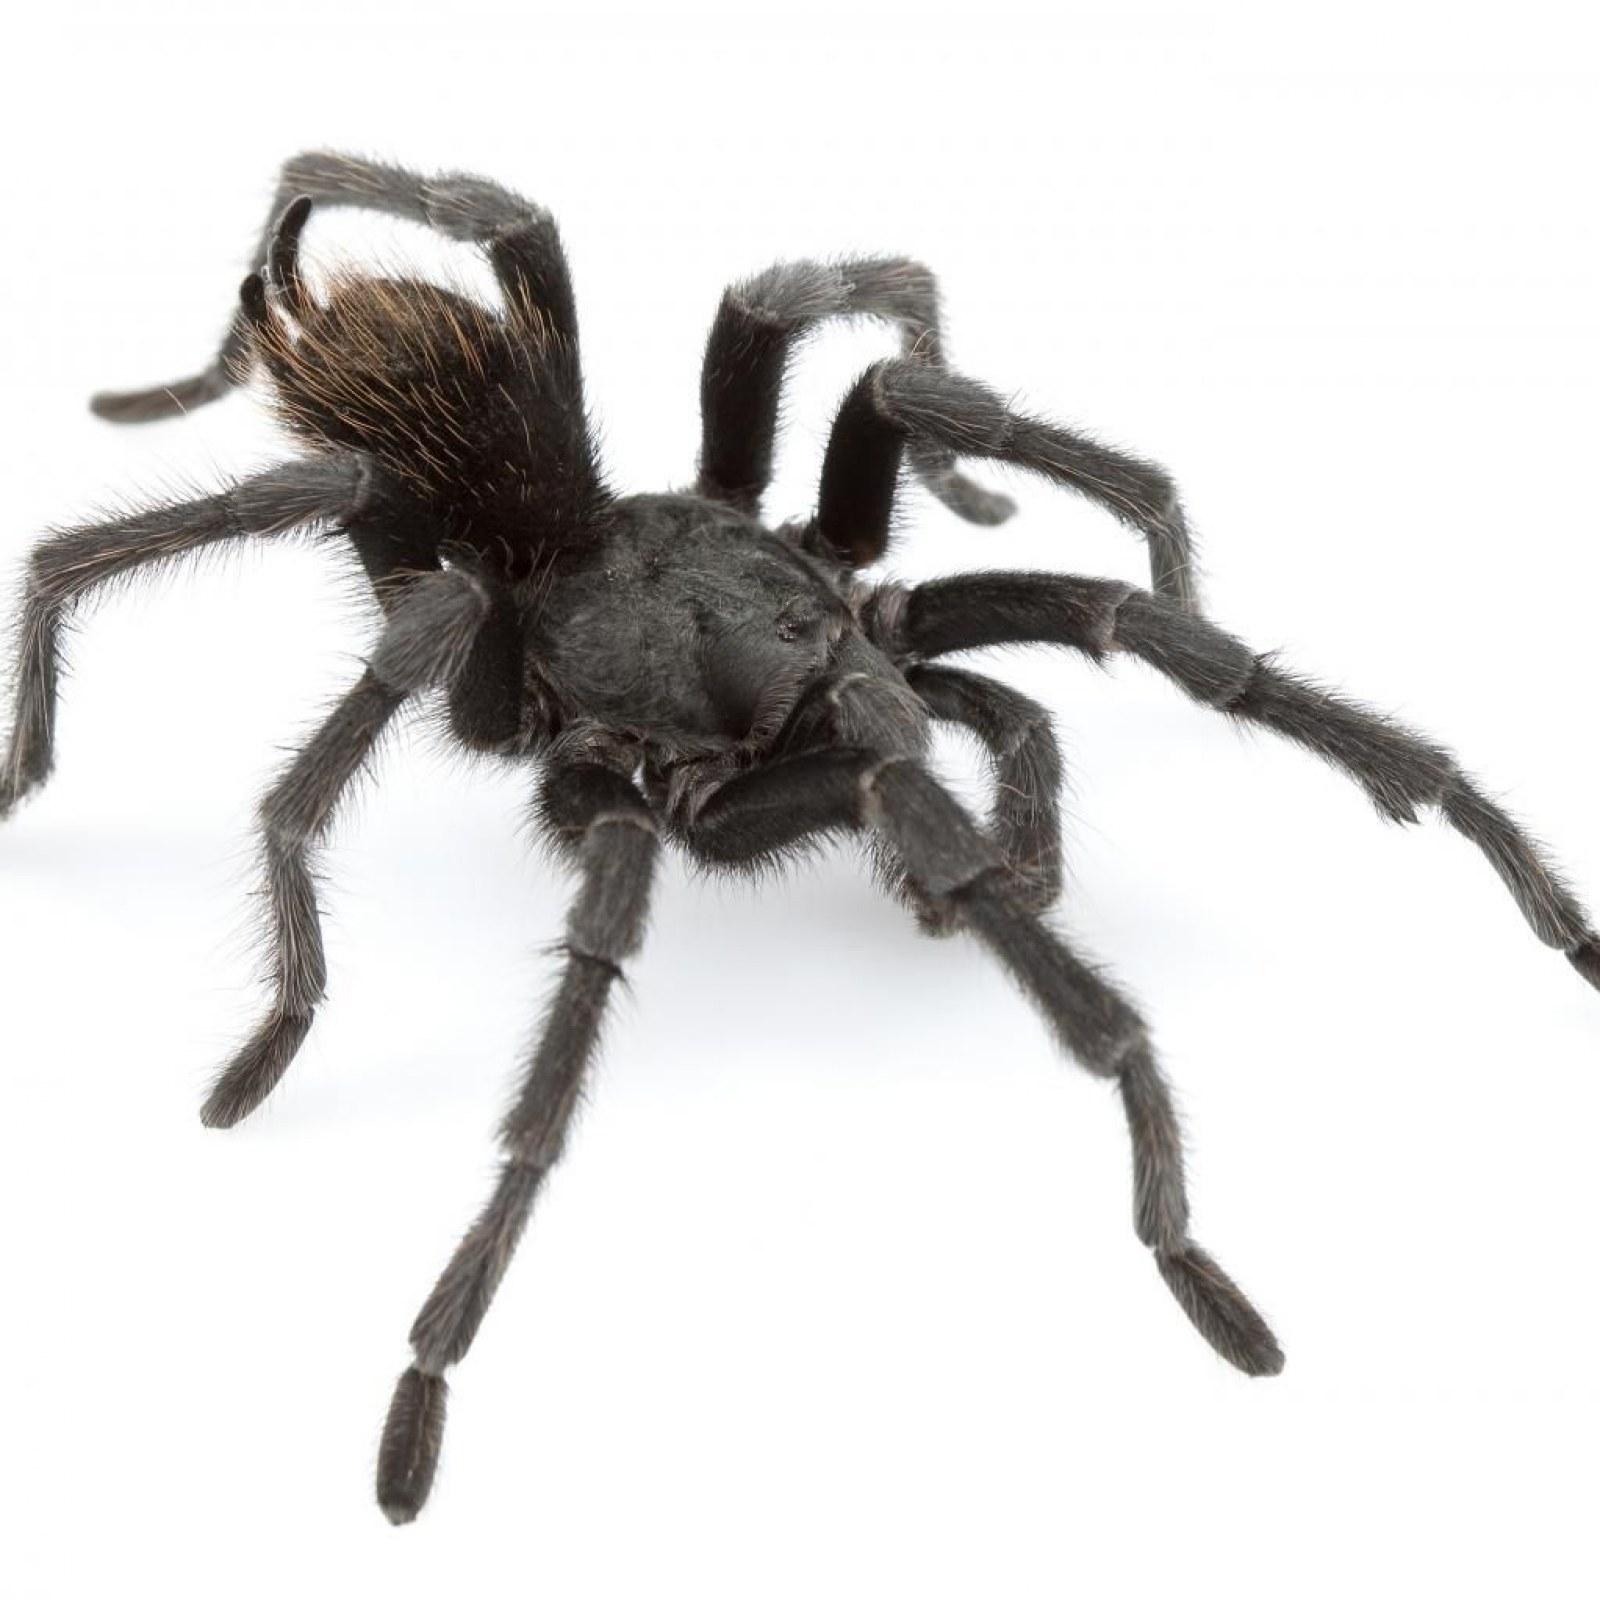 14 New Tarantula Species Found in United States